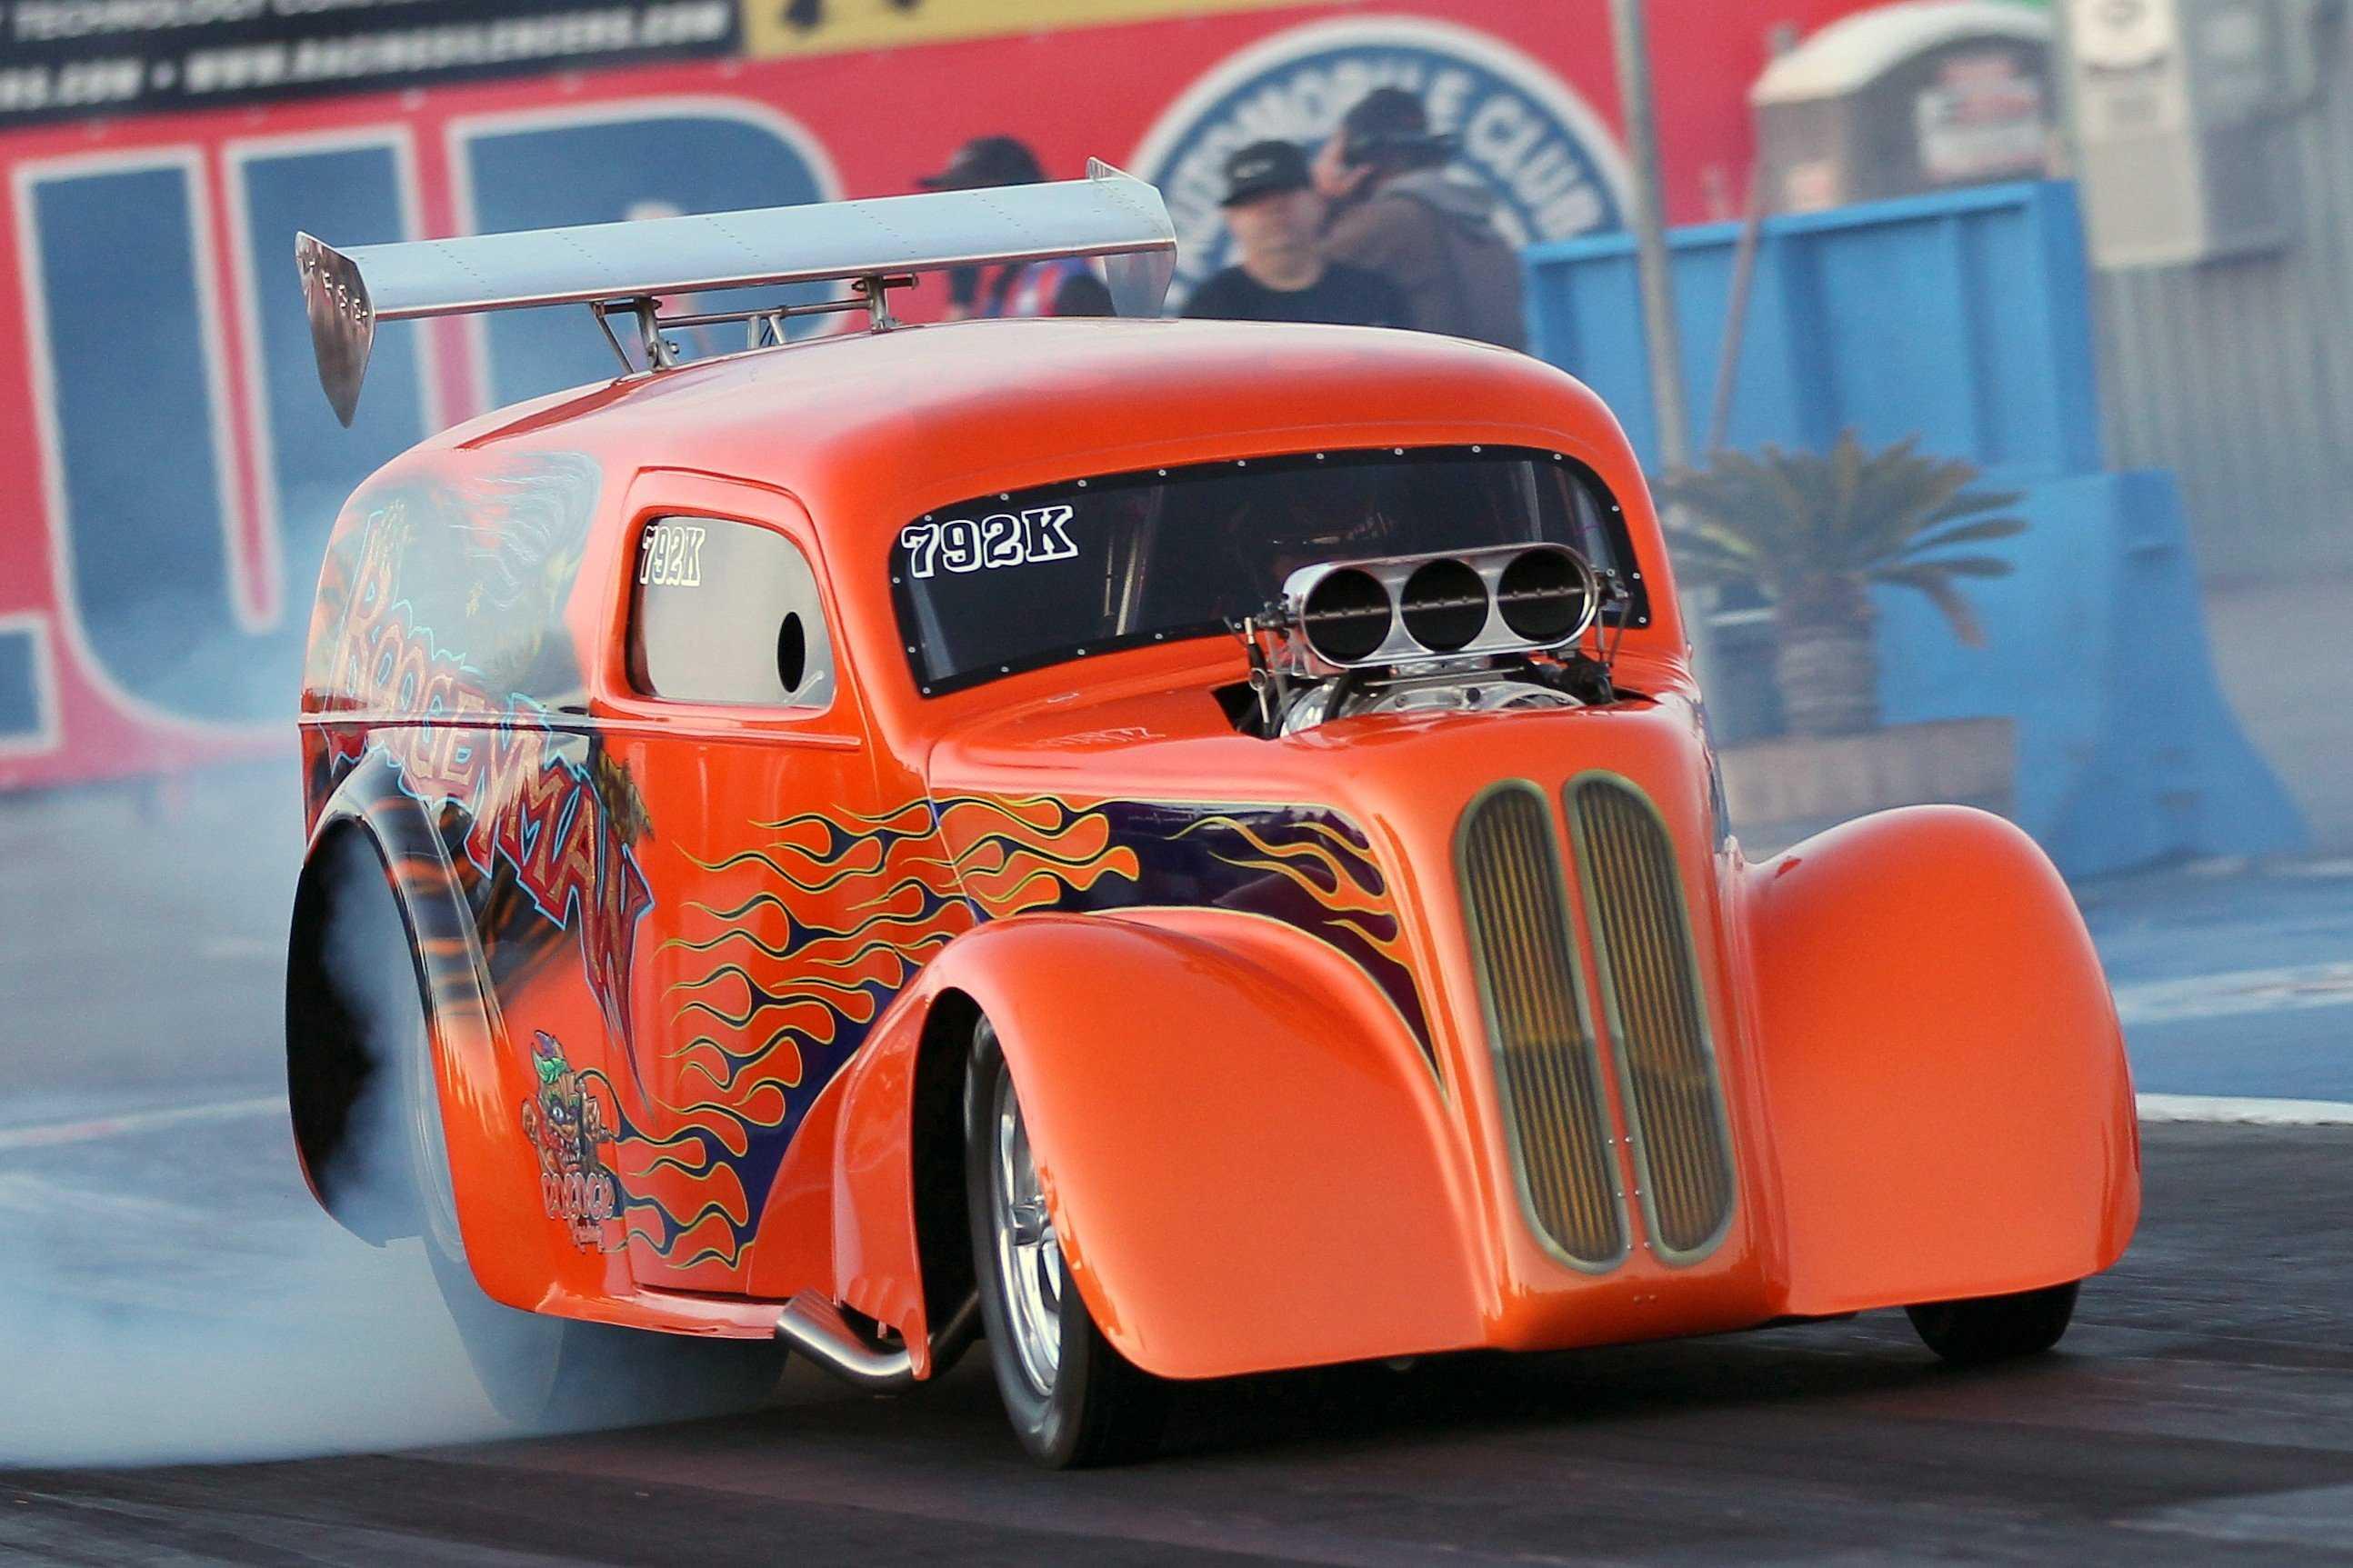 The Boogeyman Cometh: Kamaka Pocock's Nostalgia A/Gas Racer